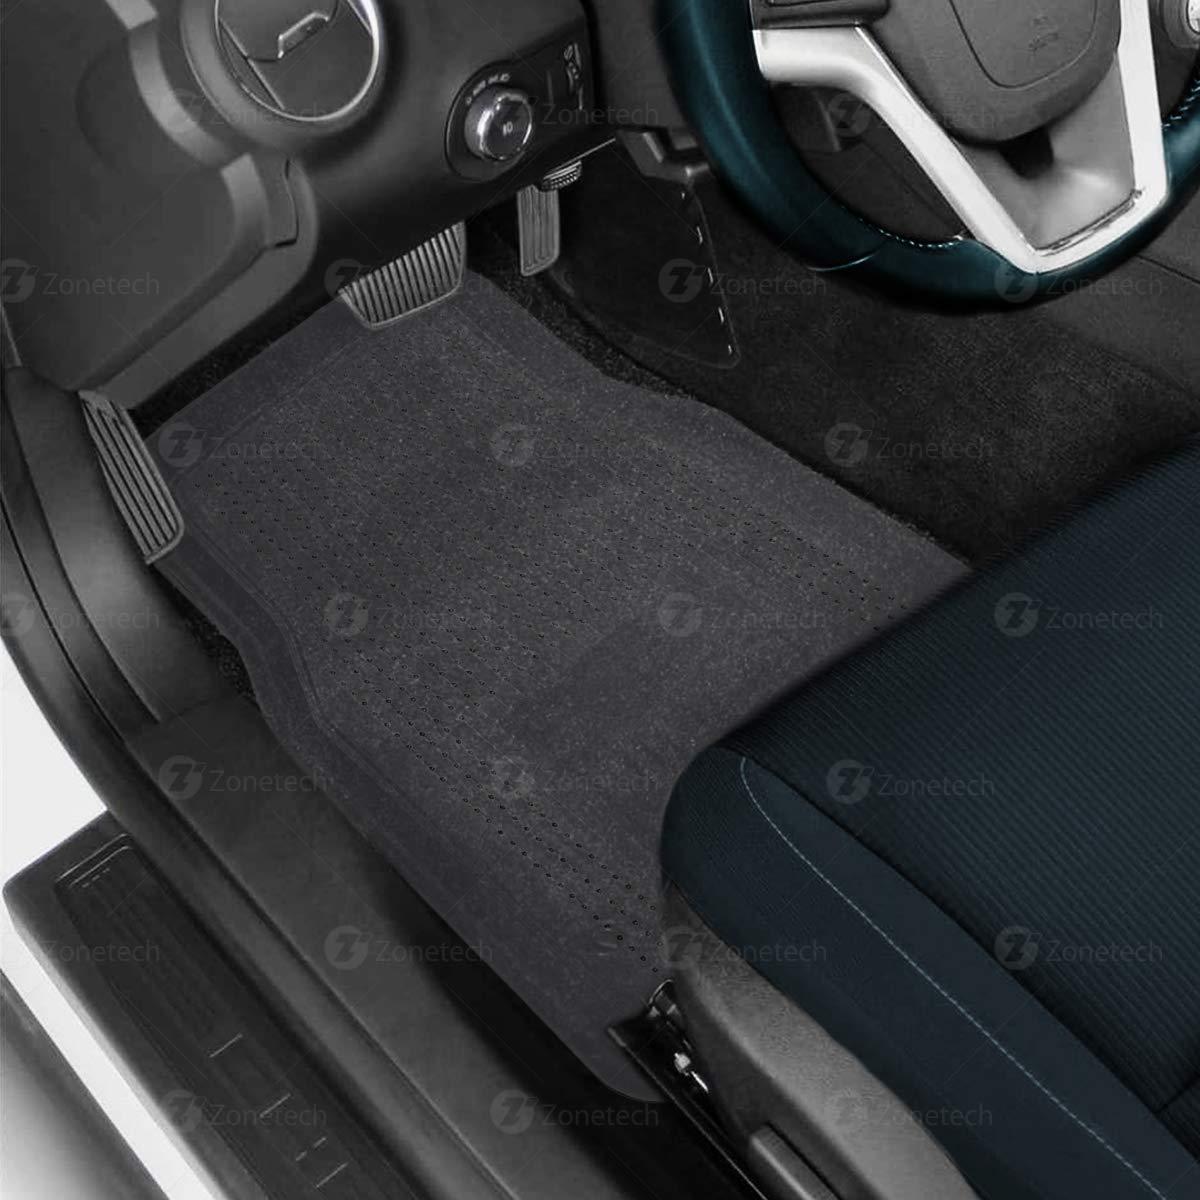 4-Piece Set Clear Heavy Duty Car Interior Floor Mats Comfort Wheels FM0004 Zone Tech All Weather Full Rubber Clear Car Interior Floor Mats